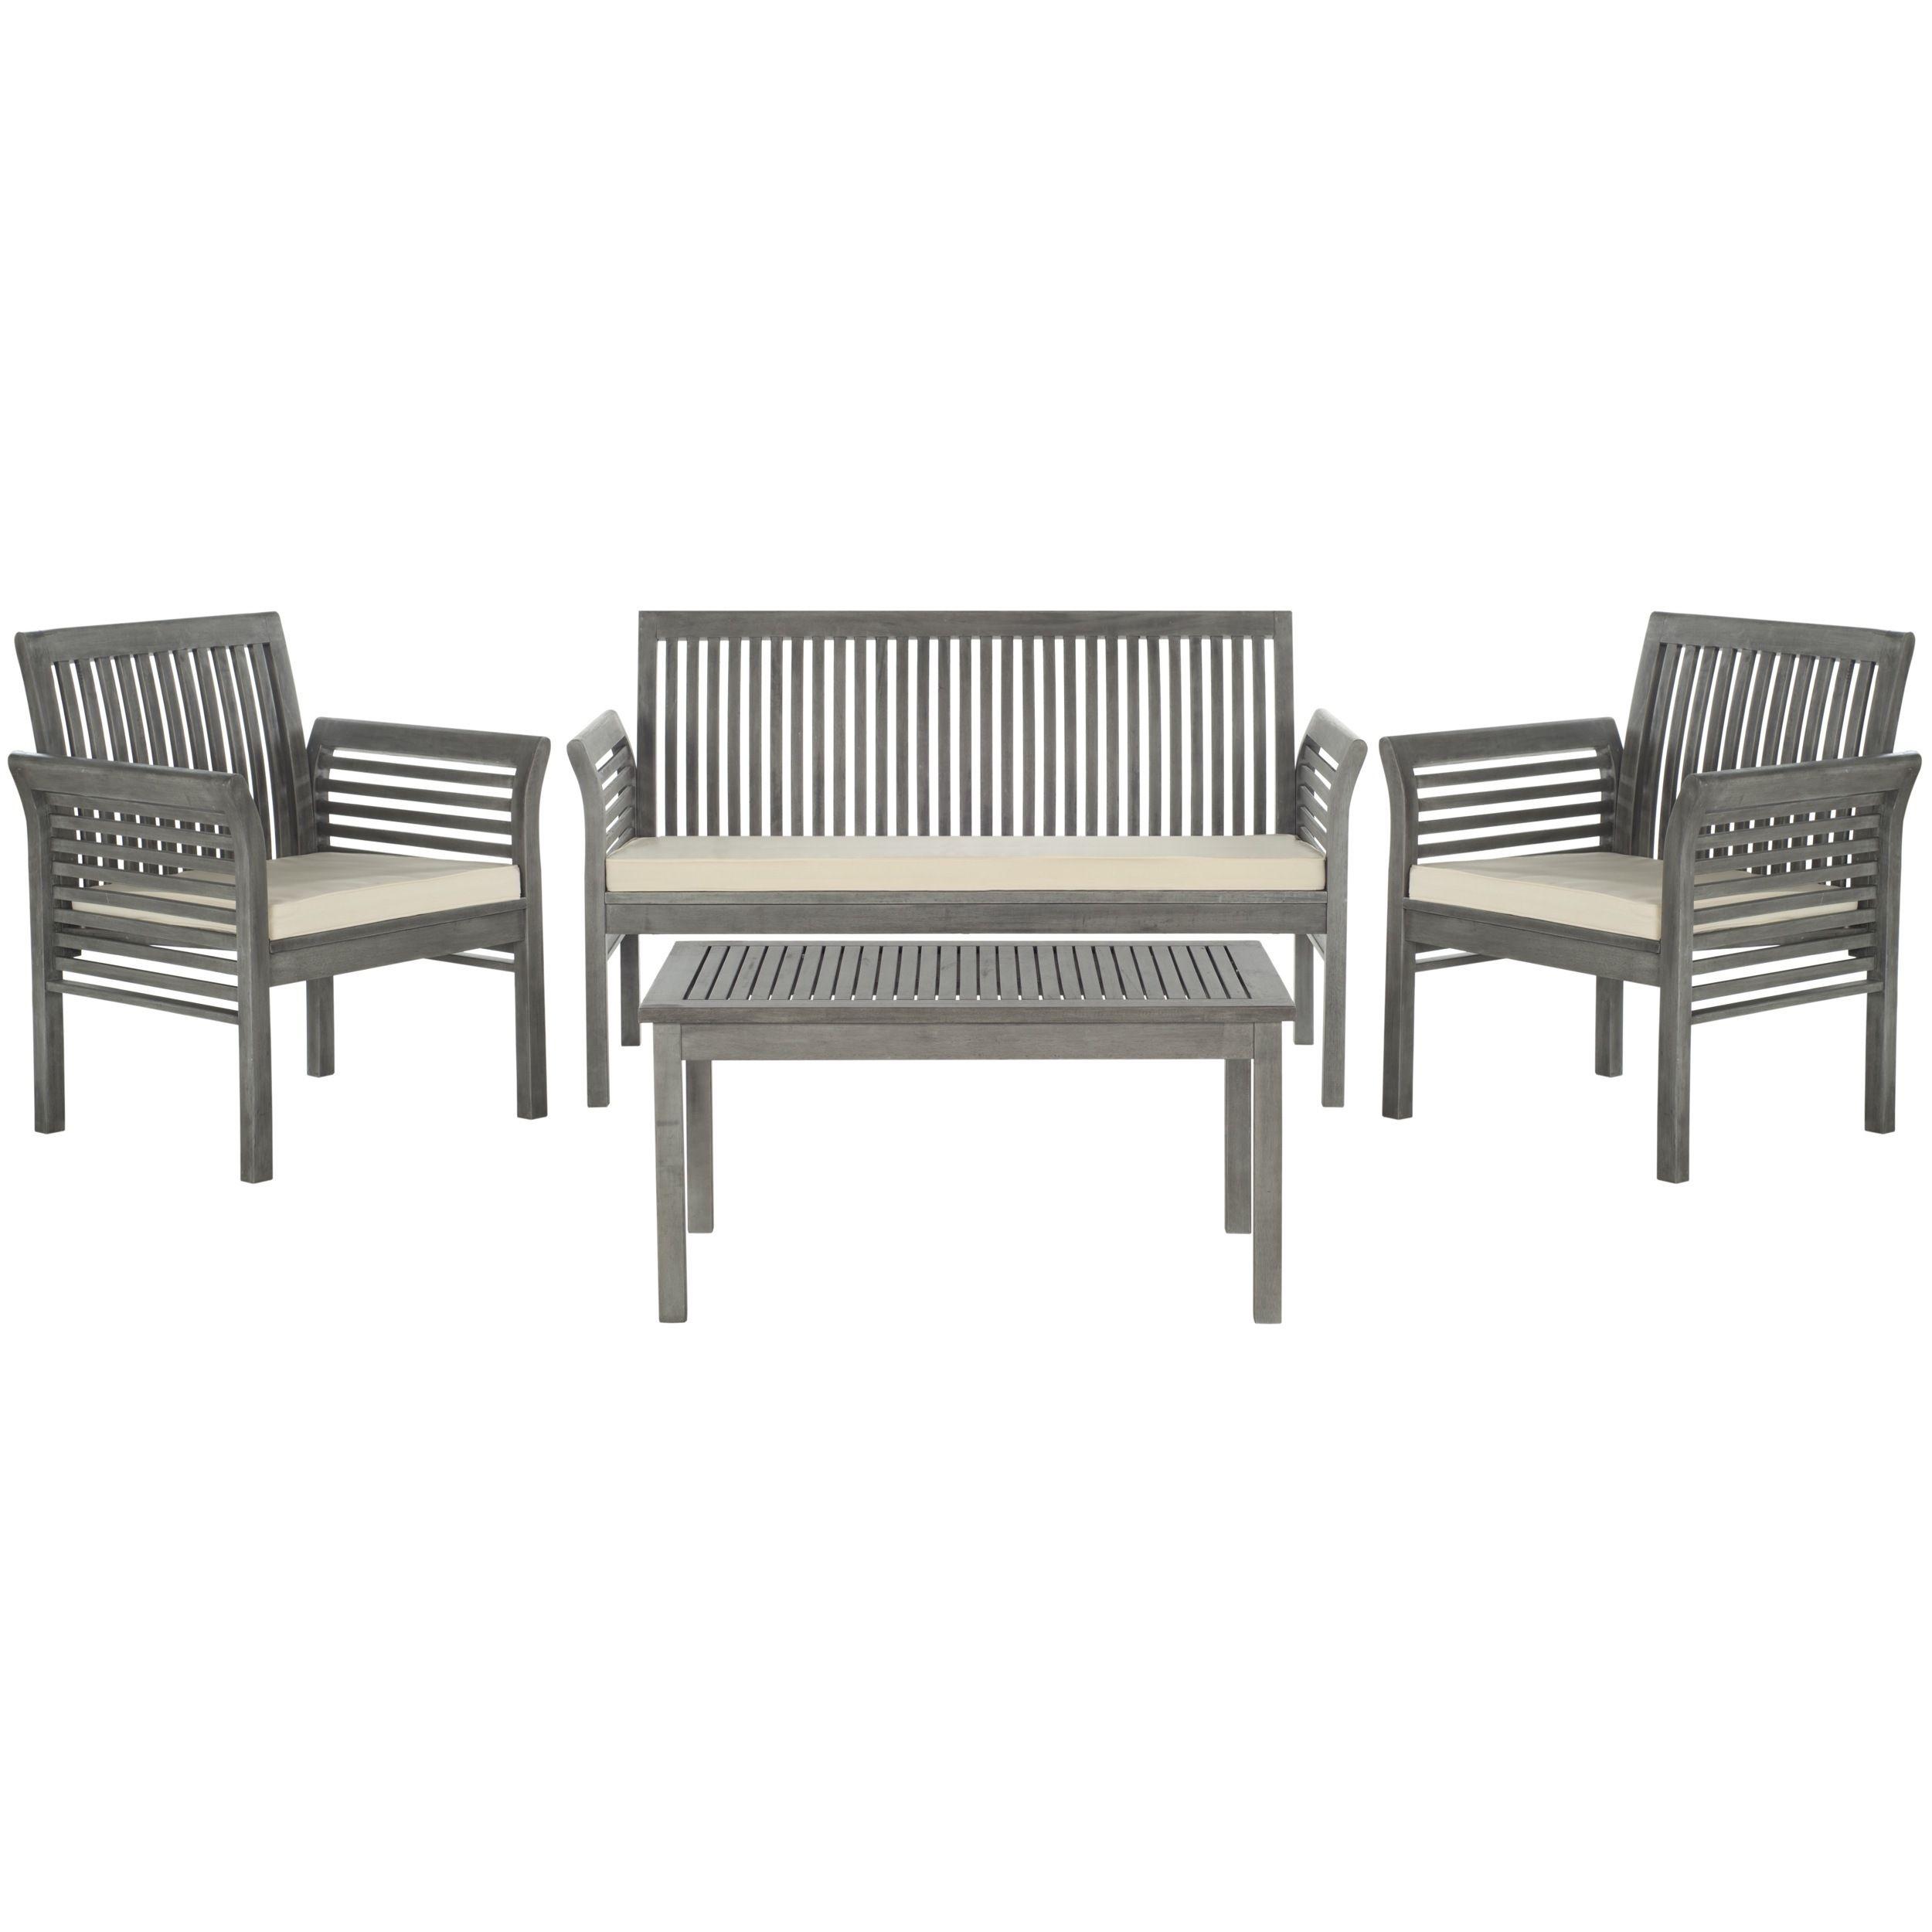 web weather sofa toffee bay hampton cushion en patio all beacon wicker park reversible tan home with df furniture p